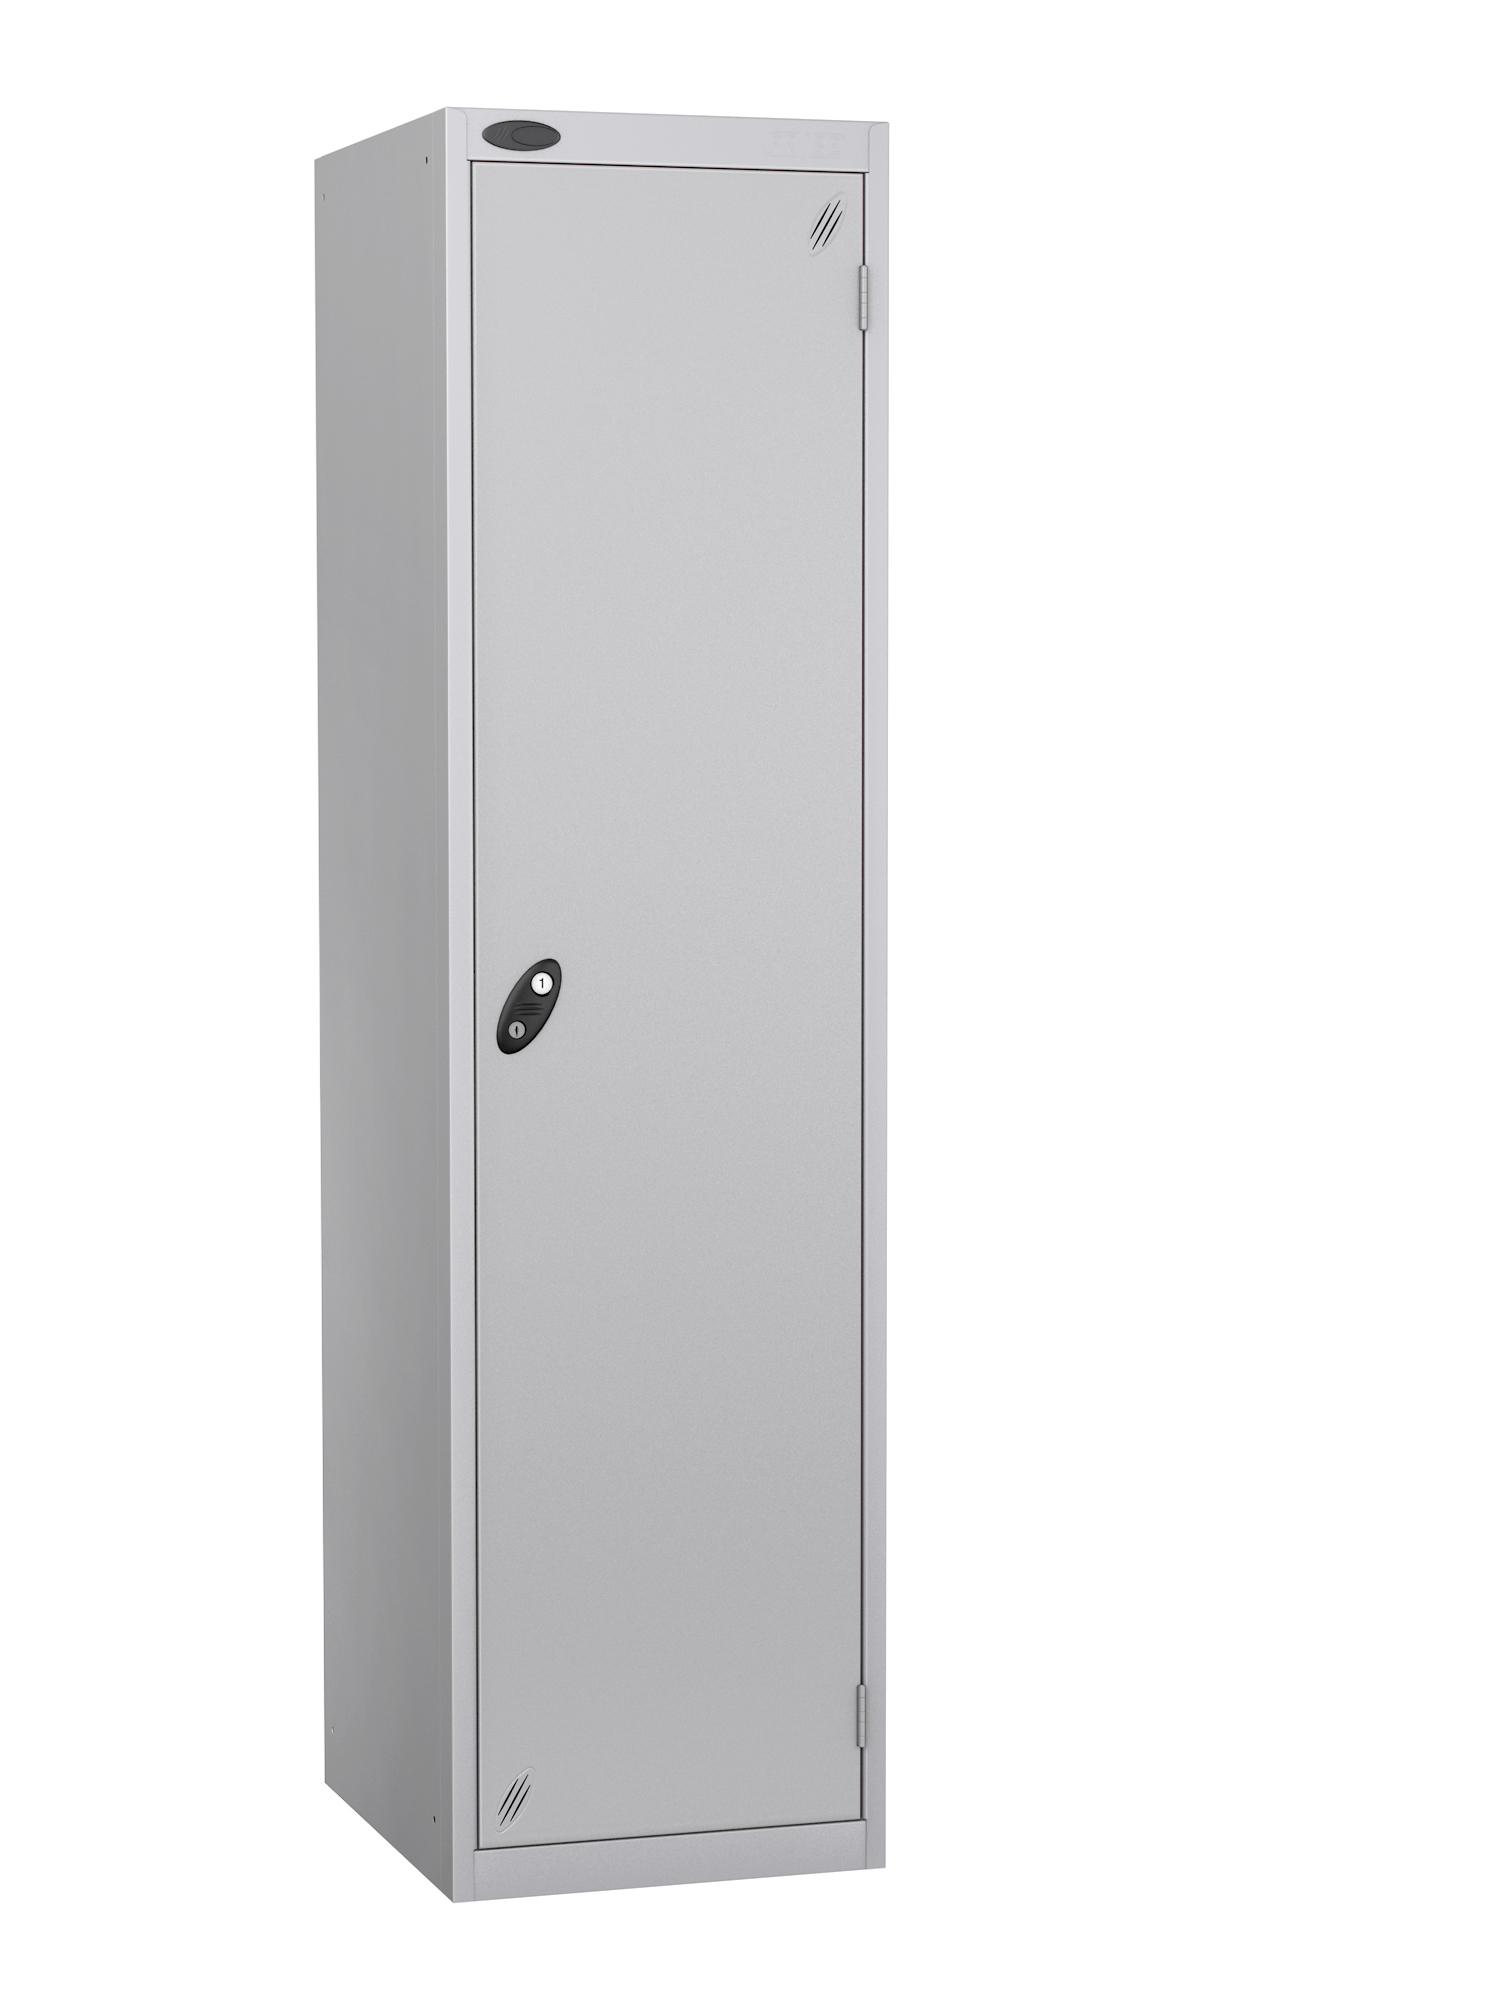 Probe specialist police locker with silver door